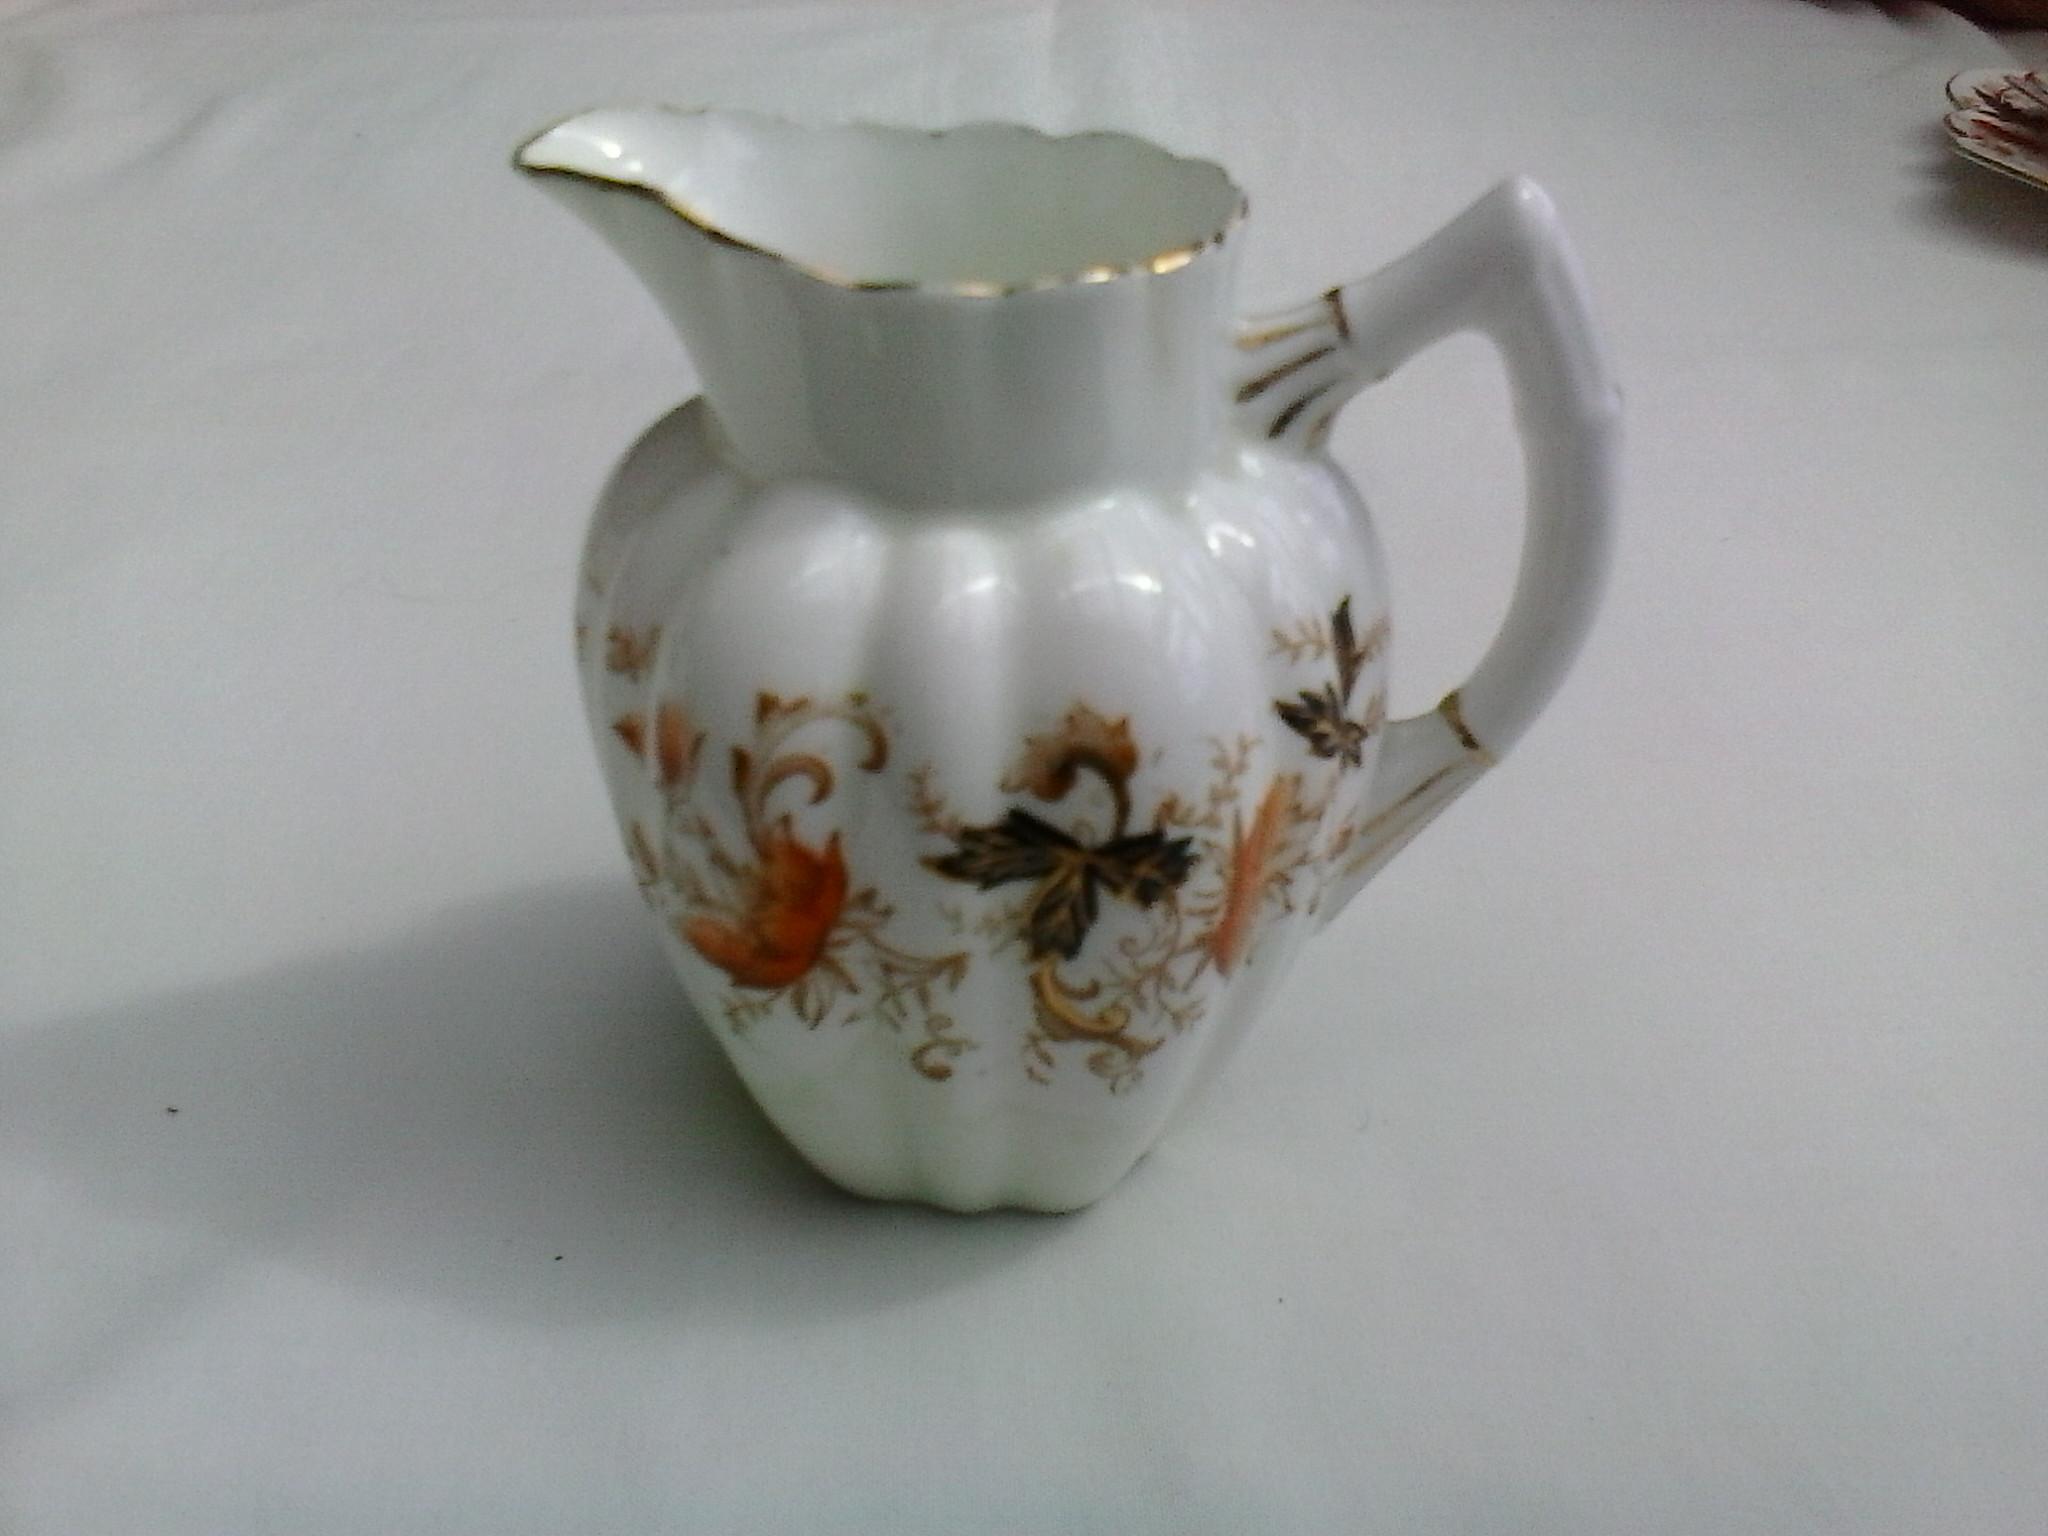 Antique, Rare & beautiful Paragon fine china teaset